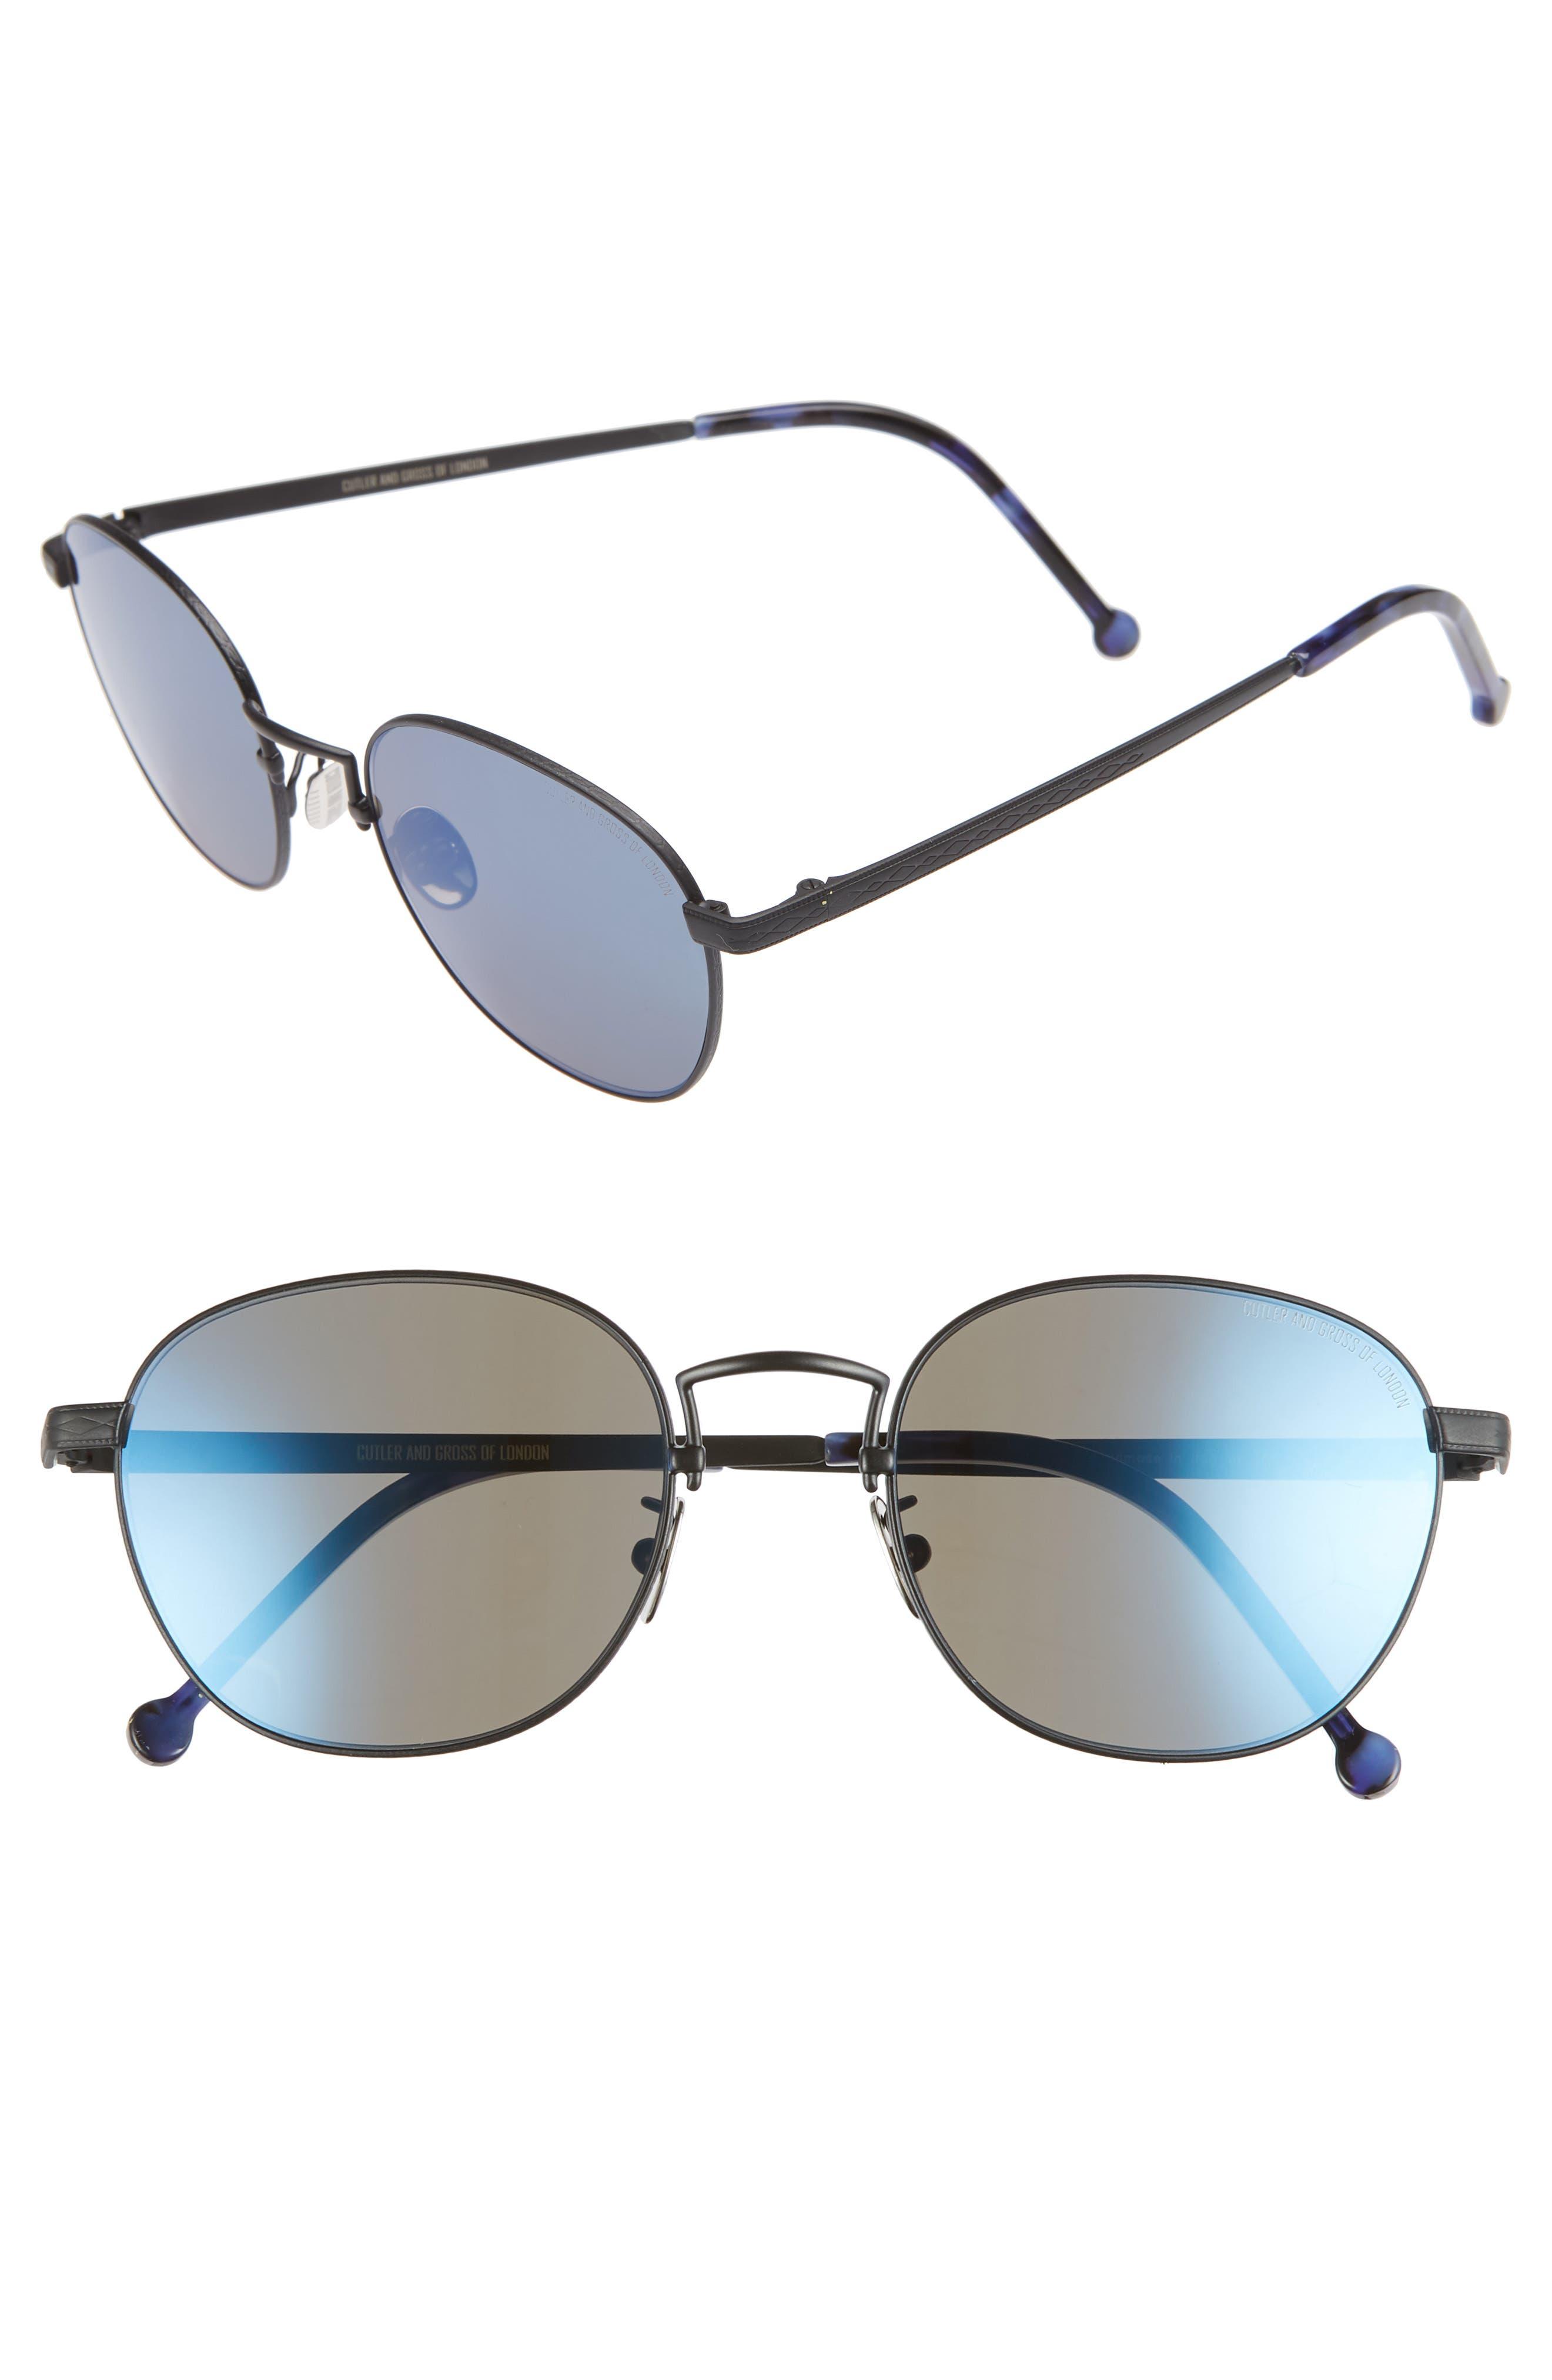 CUTLER AND GROSS, 52mm Polarized Round Sunglasses, Main thumbnail 1, color, SATIN PALLADIUM/ BLUE